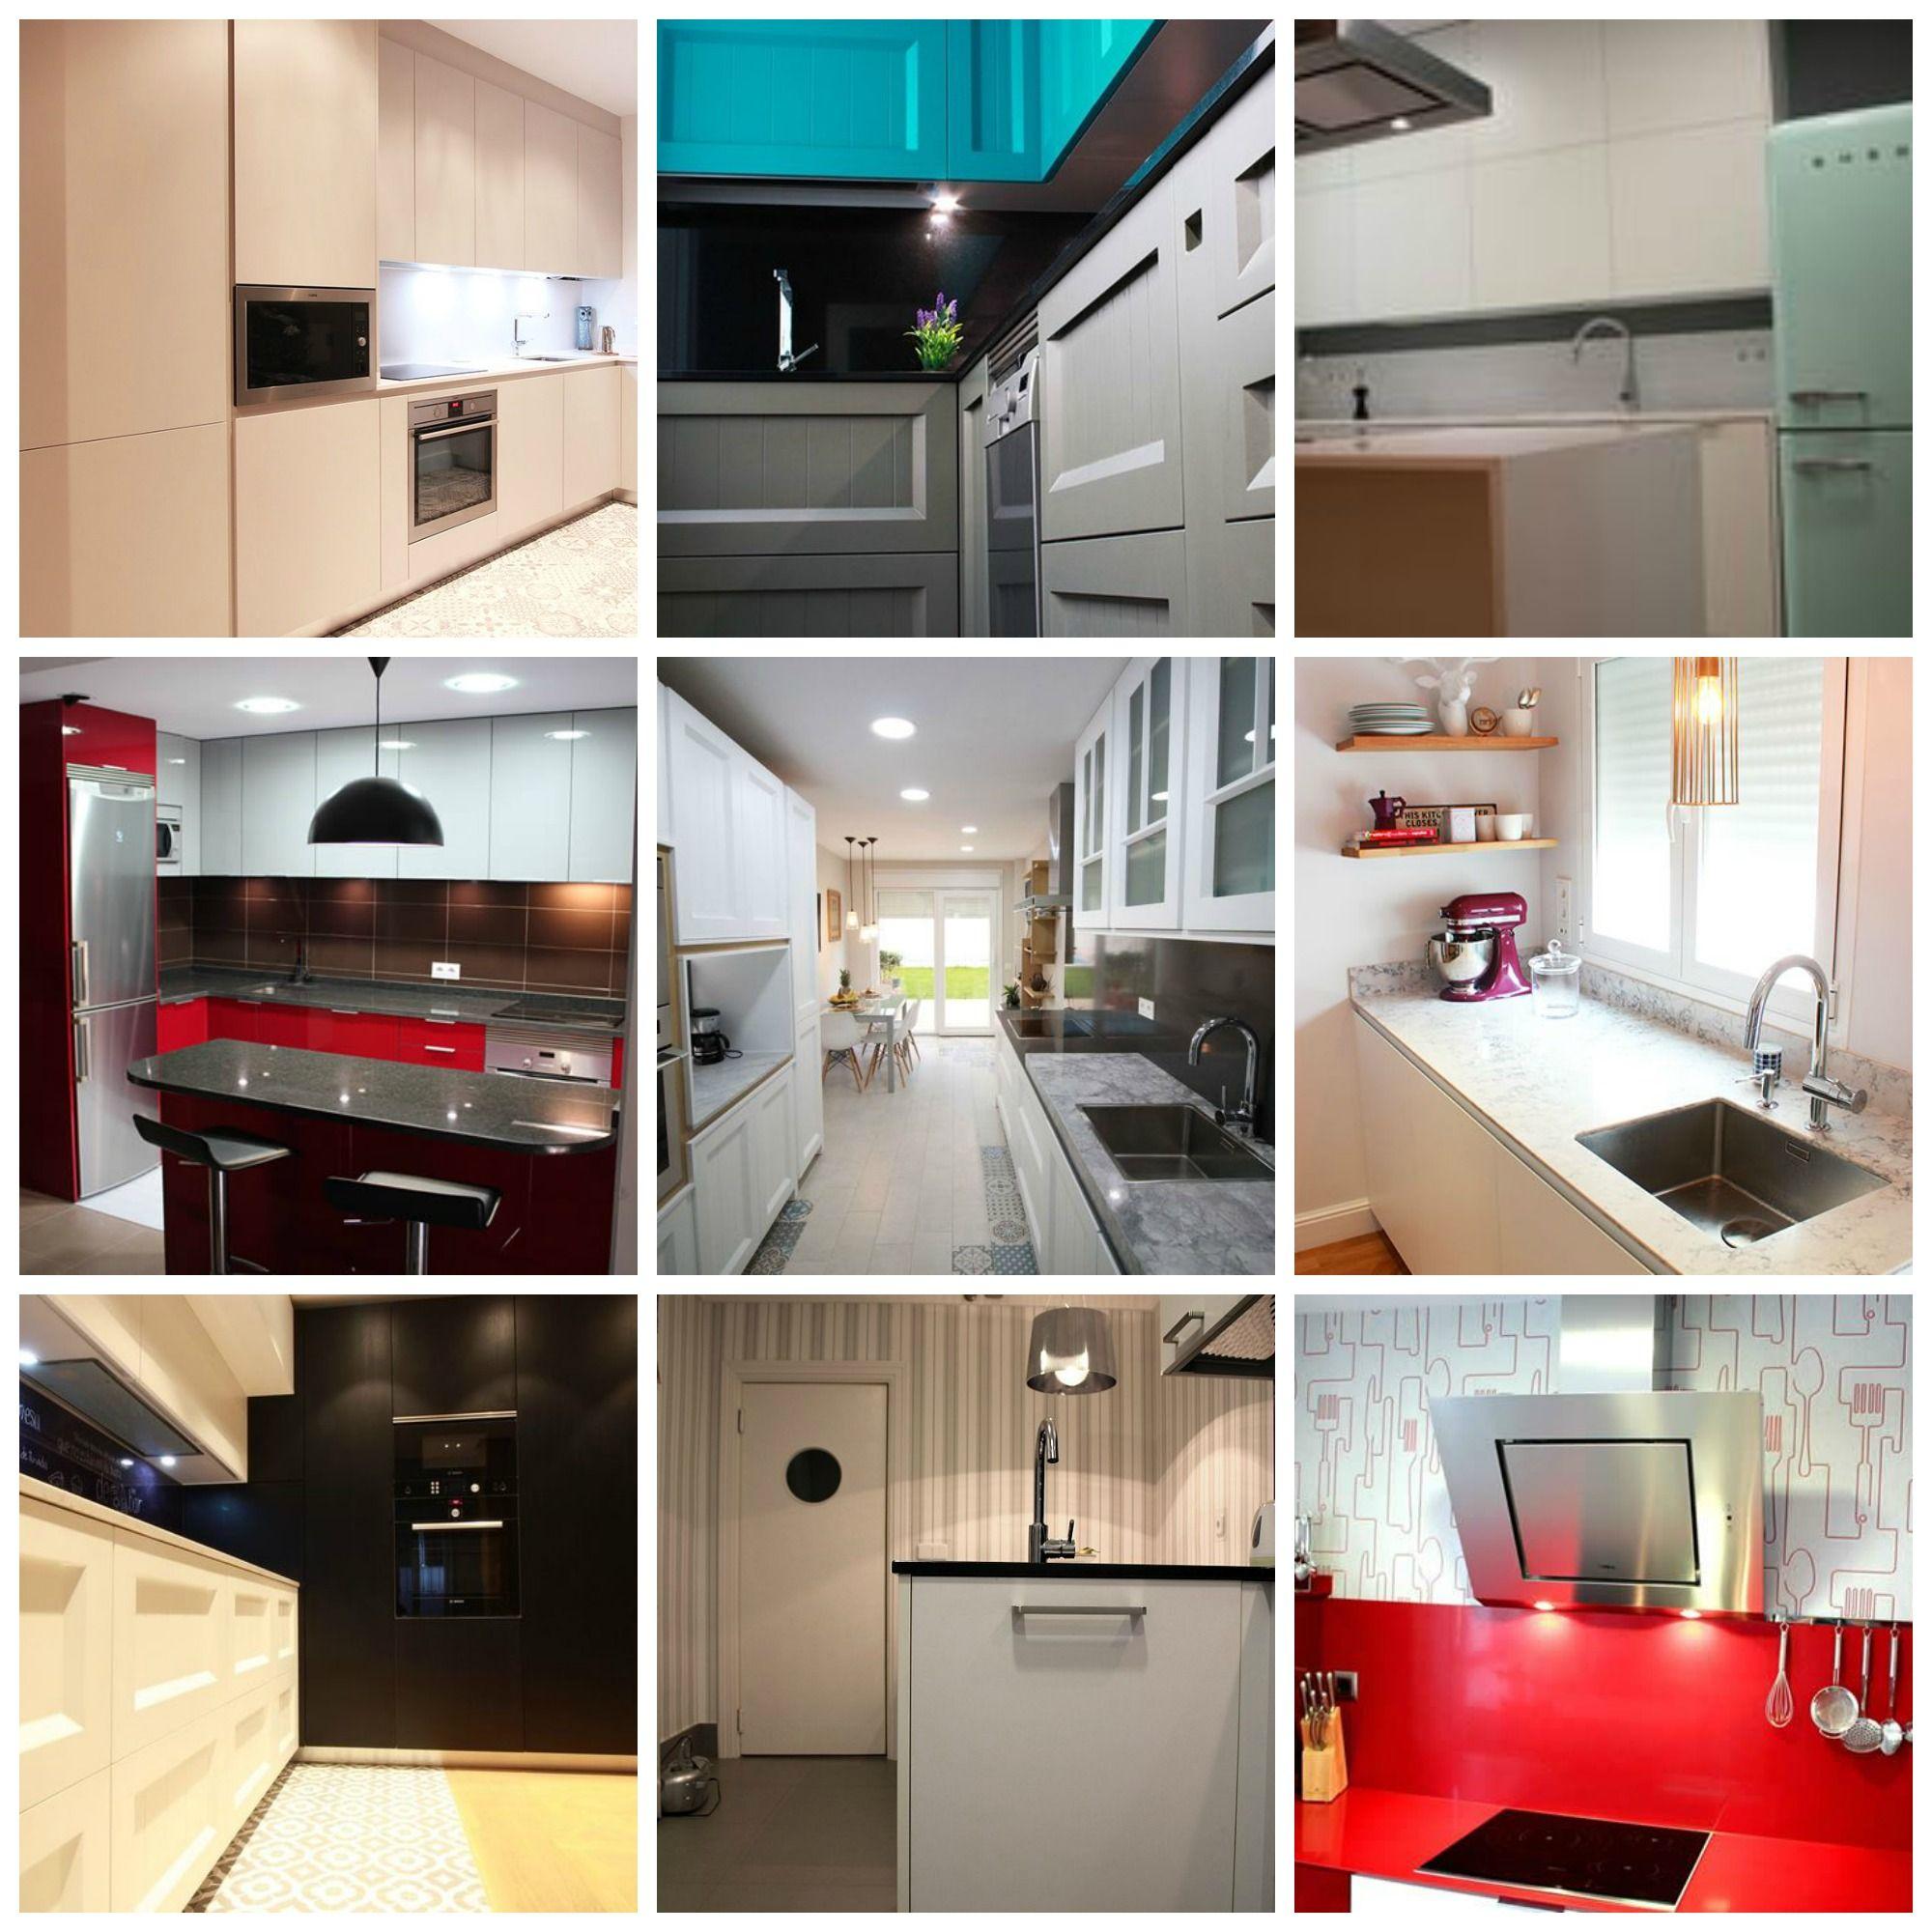 Cocinas de l nea 3 cocinas - Linea 3 cocinas ...